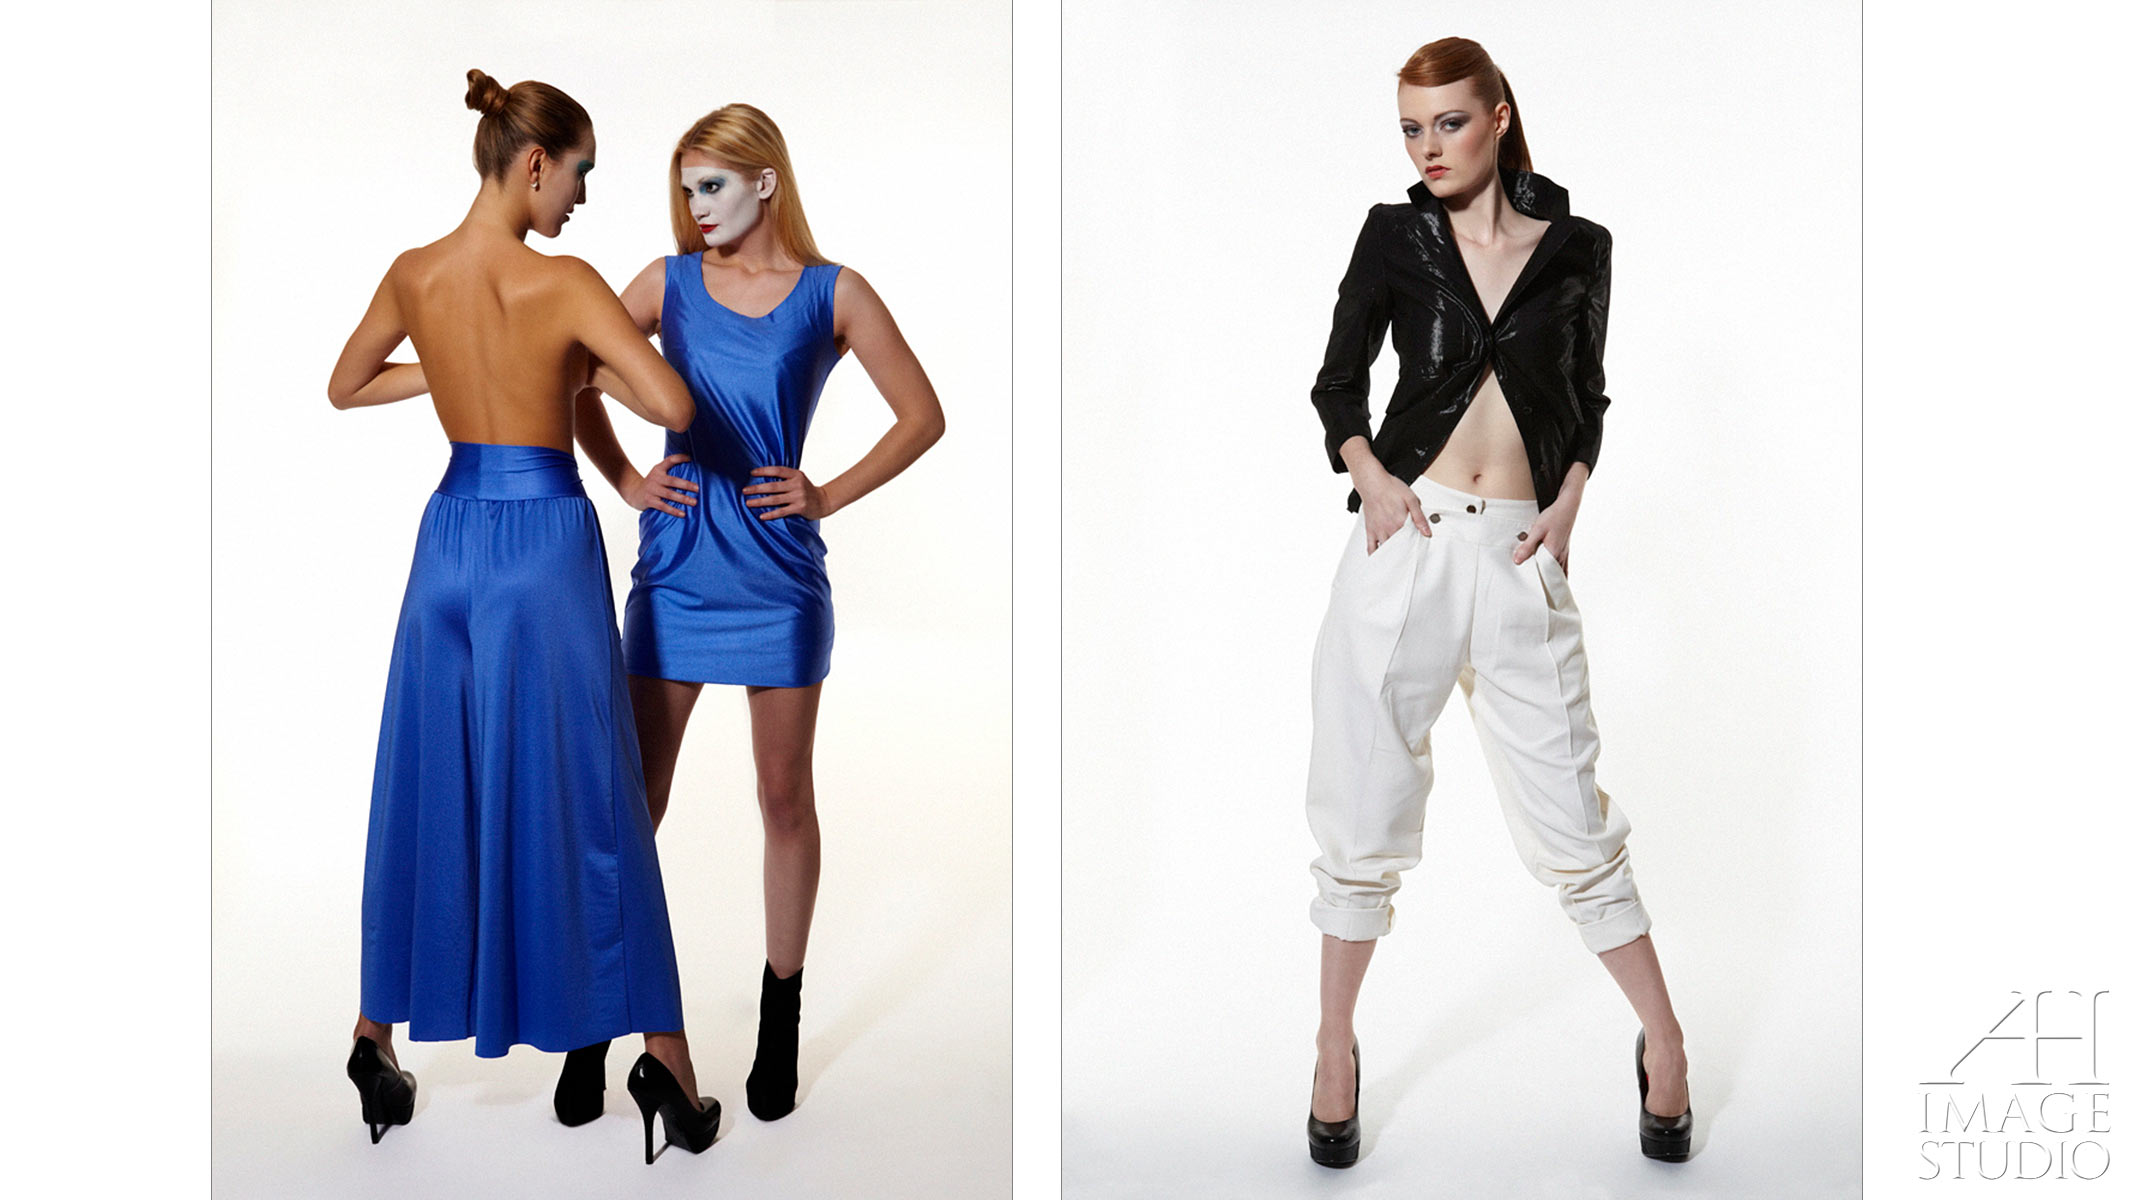 flash photography fashion and models portfolio